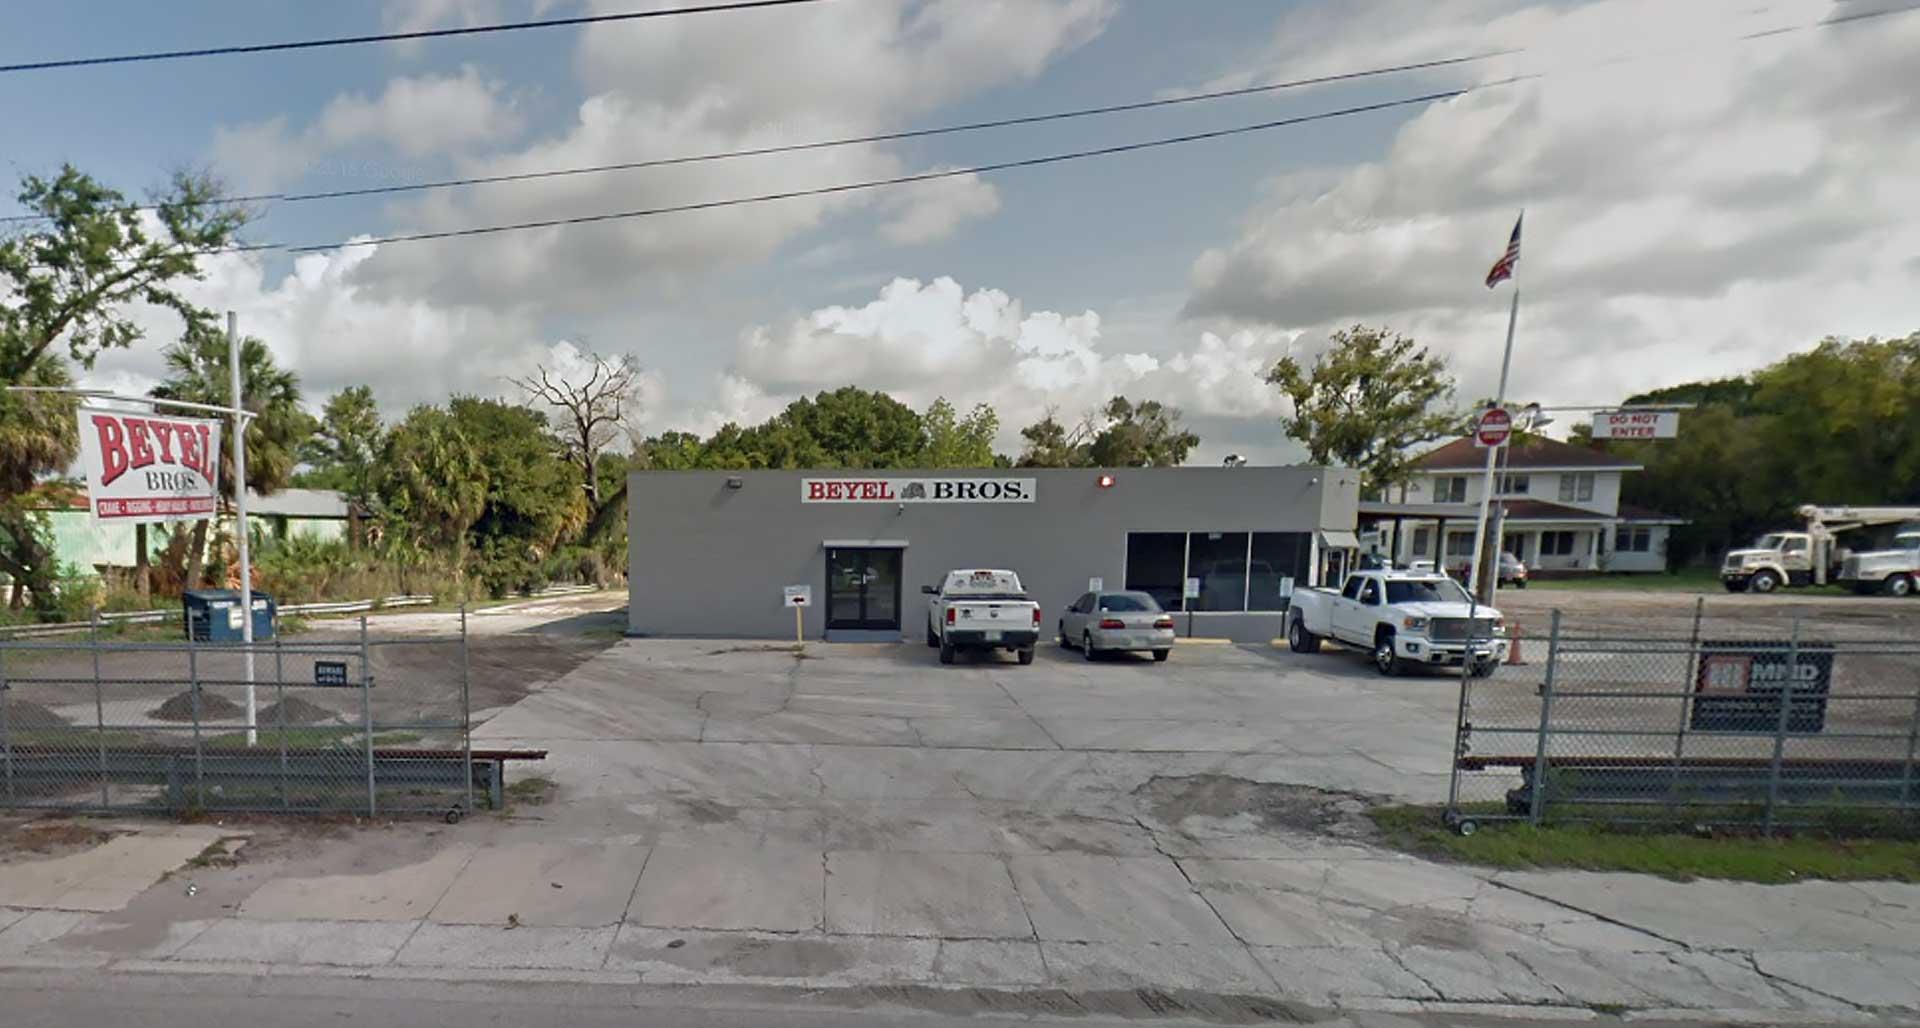 Beyel Brothers - Tampa, FL - www.beyel.com